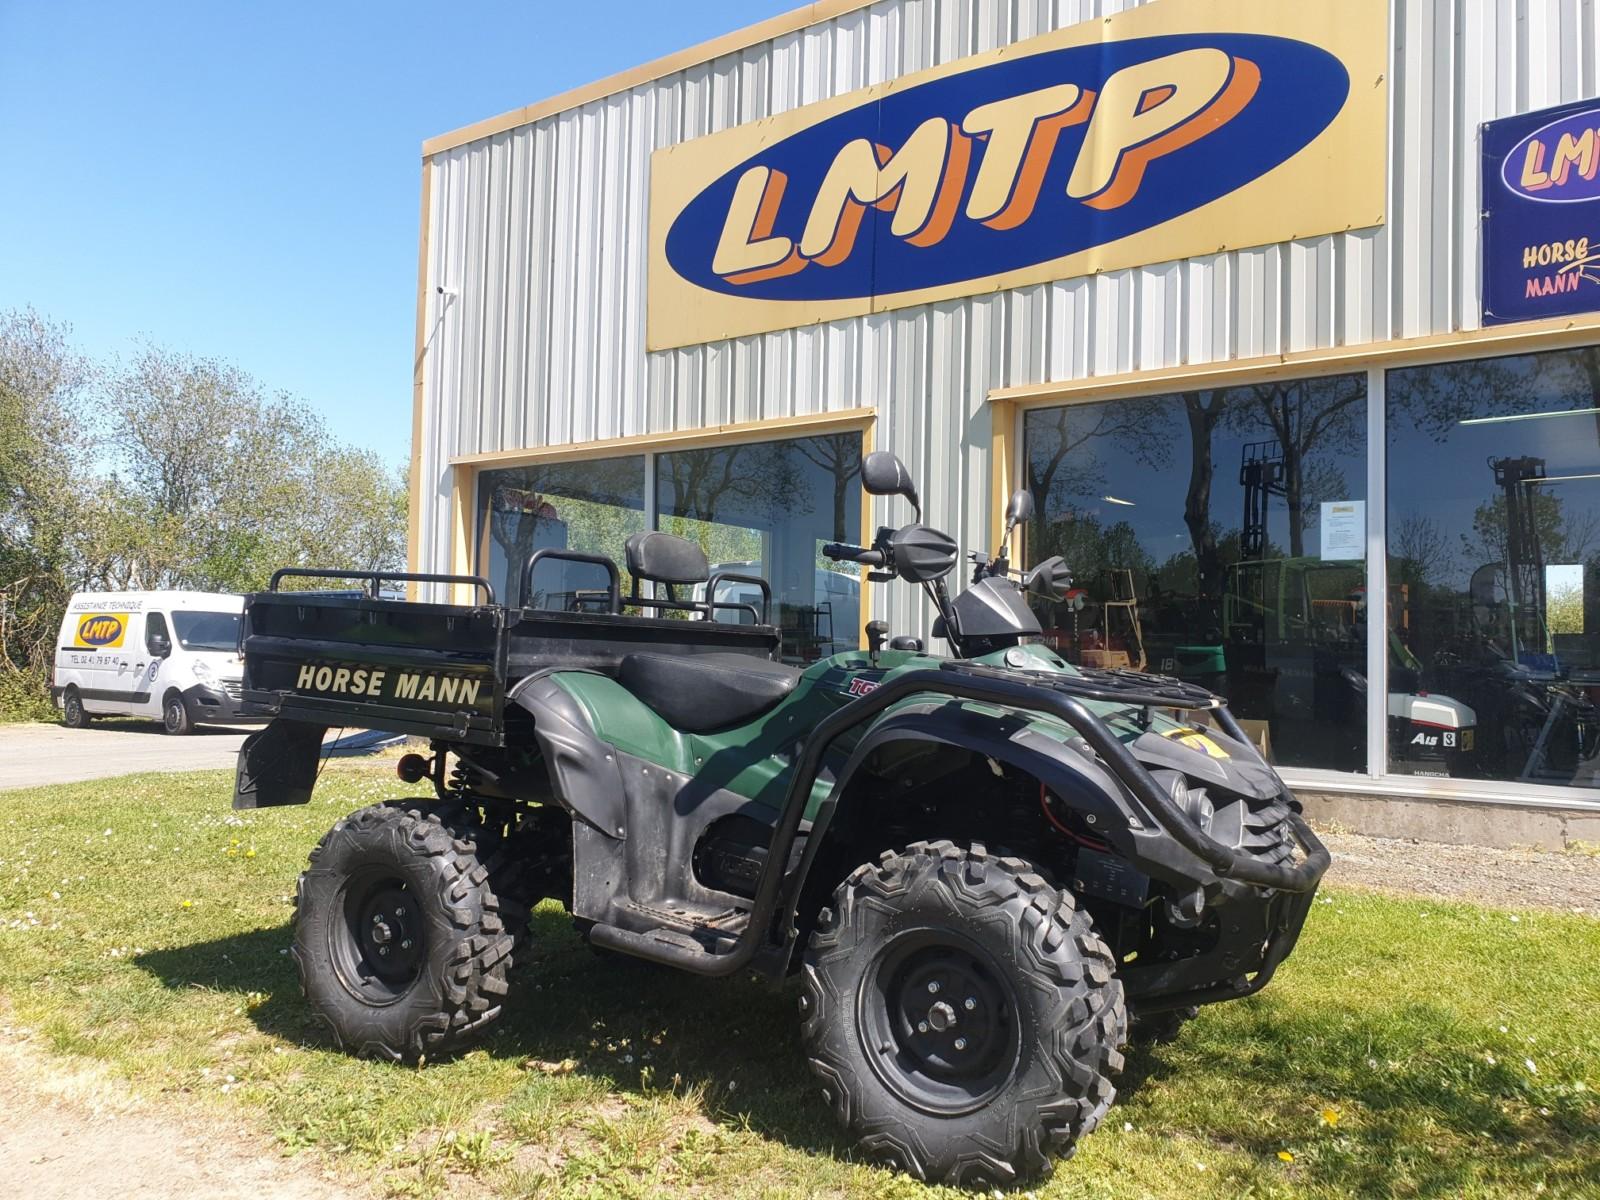 LMTP LOIRE MANUTENTION TP Tgb Farm 328